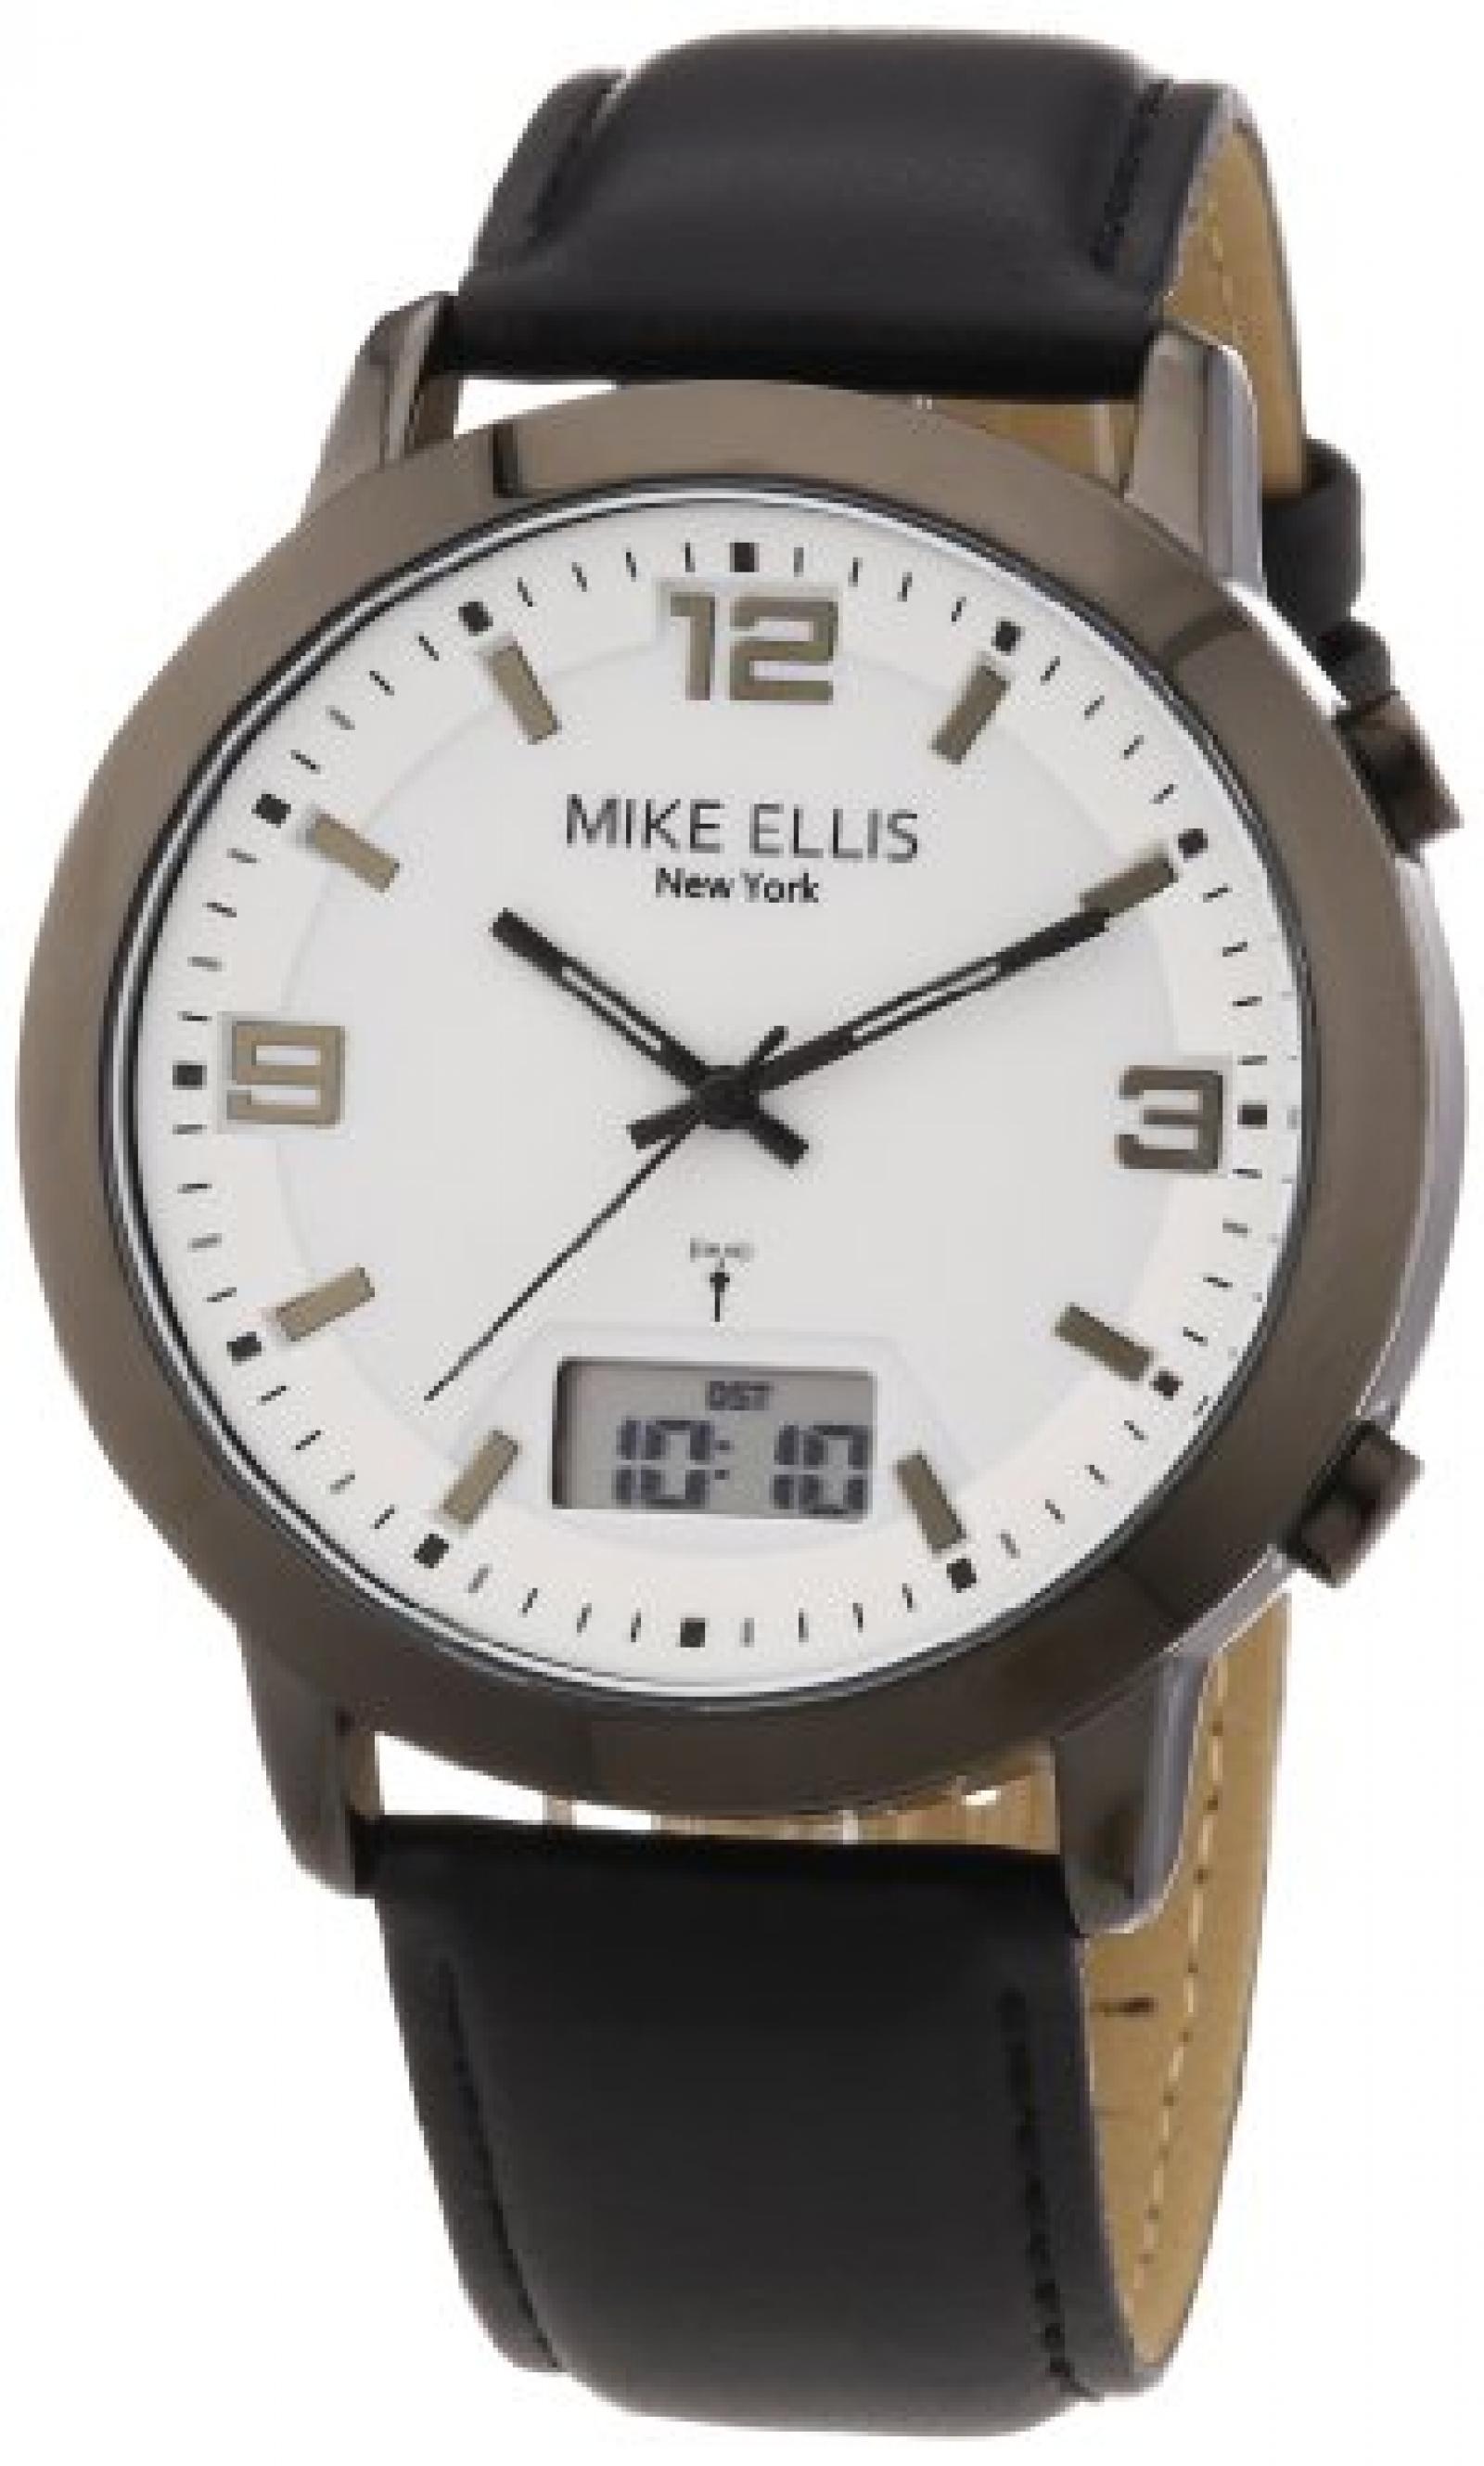 Mike Ellis New York Herren-Armbanduhr Analog - Digital Quarz Leder M2941ANU/1